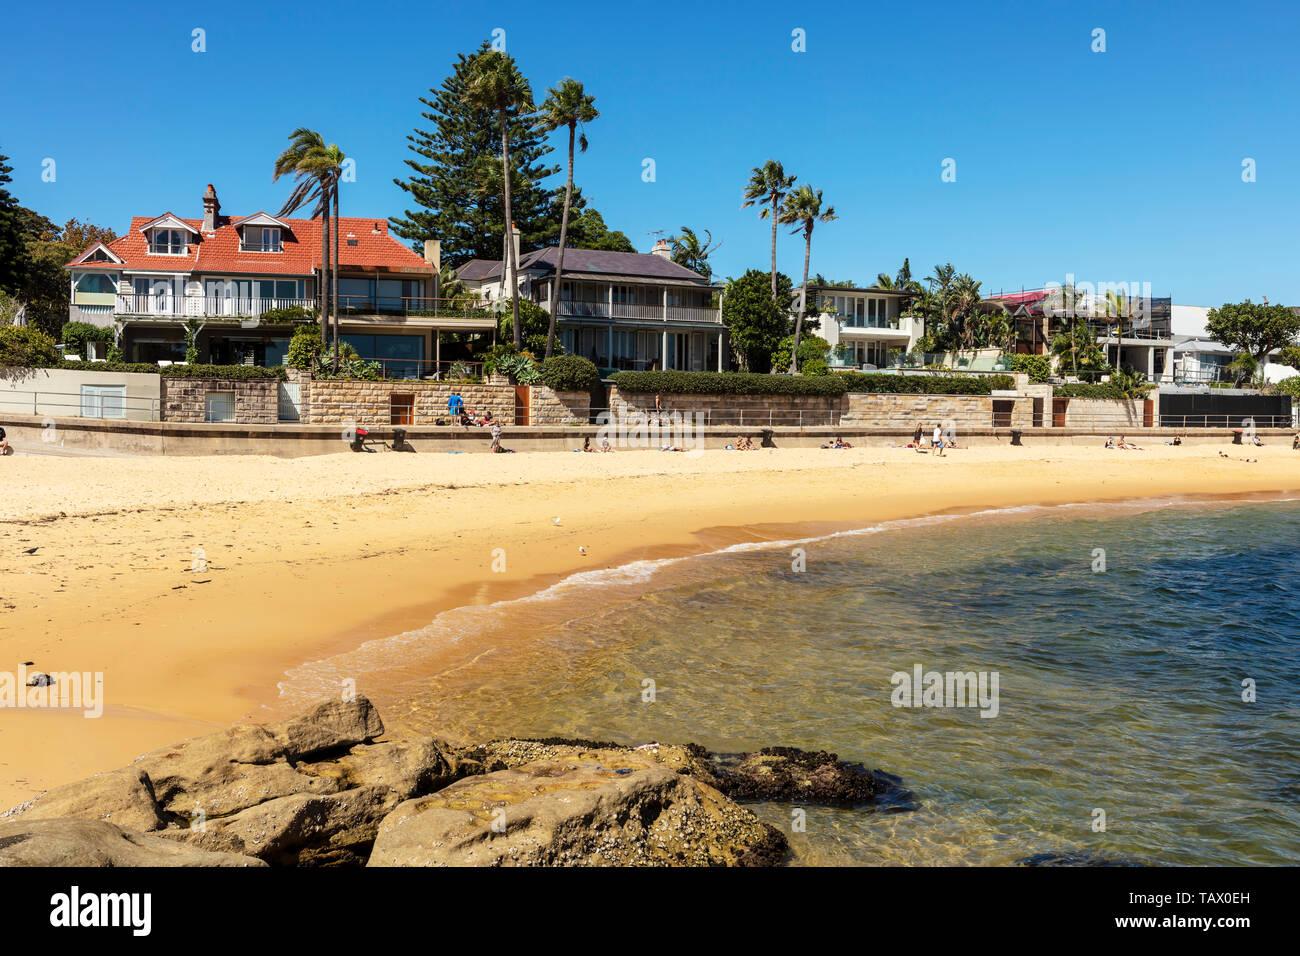 Pristine Camp Cove beach in Watson's Bay near Sydney, Australia. - Stock Image